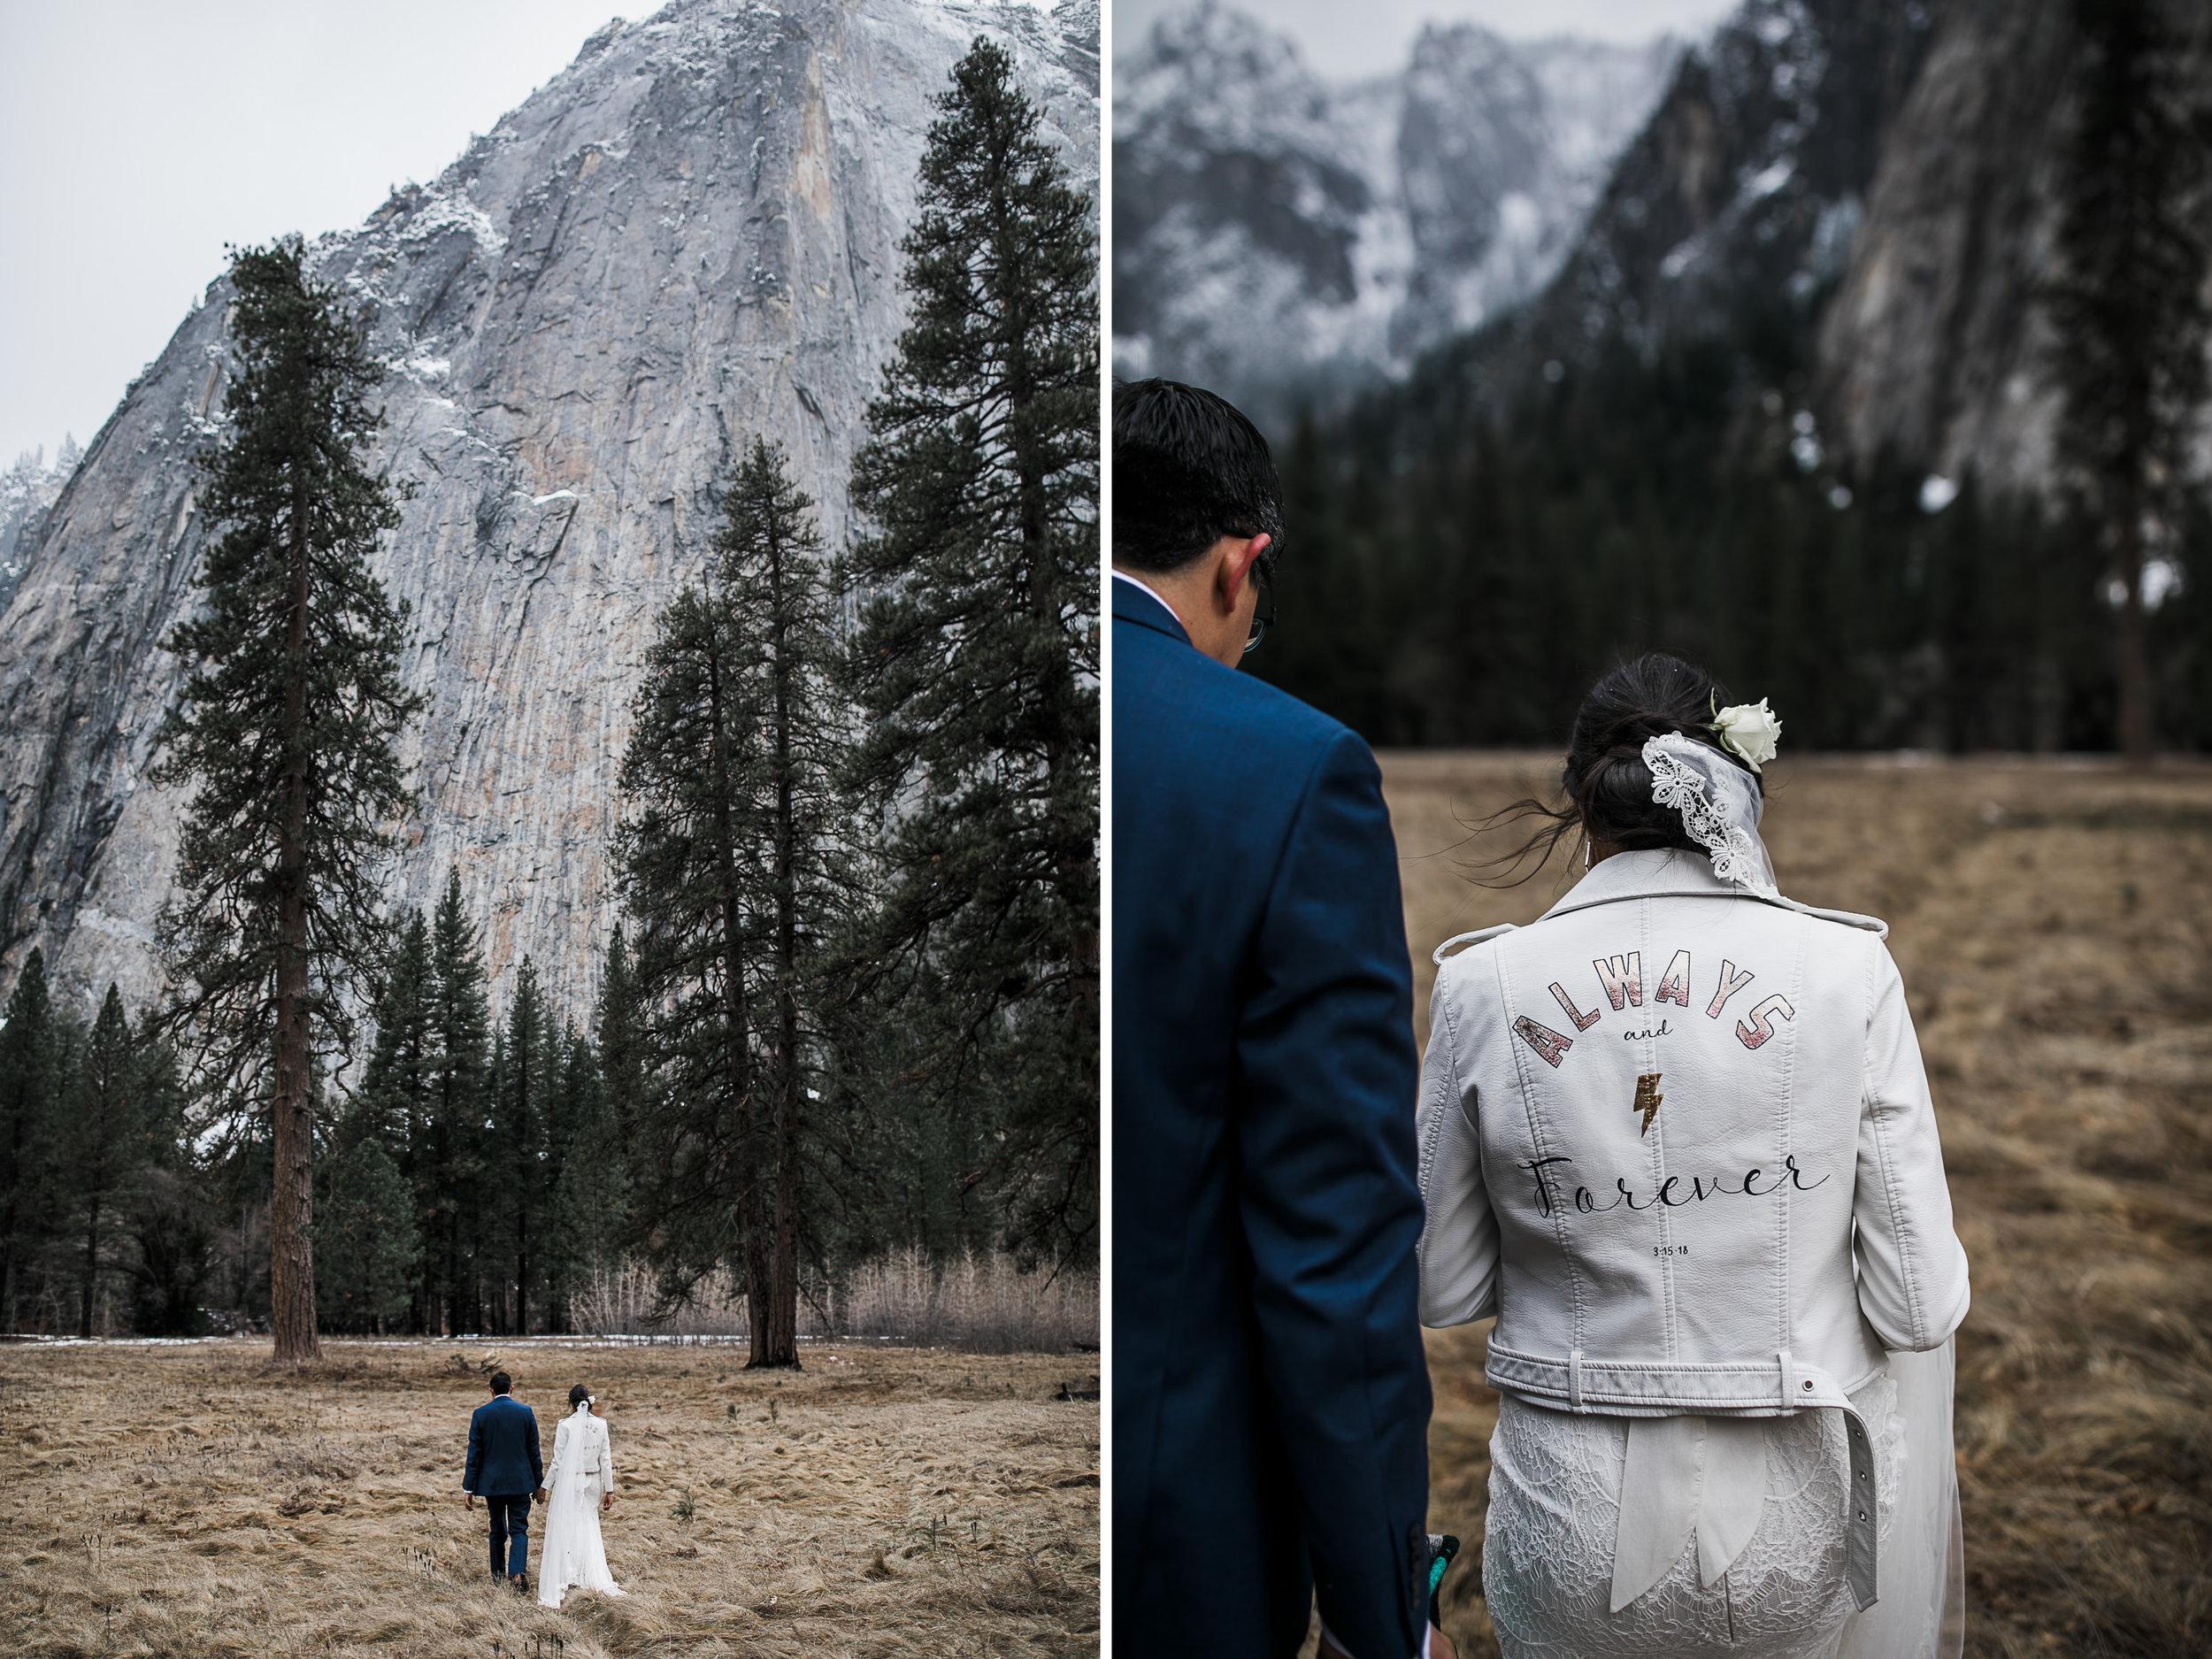 snowy wedding day in yosemite national park